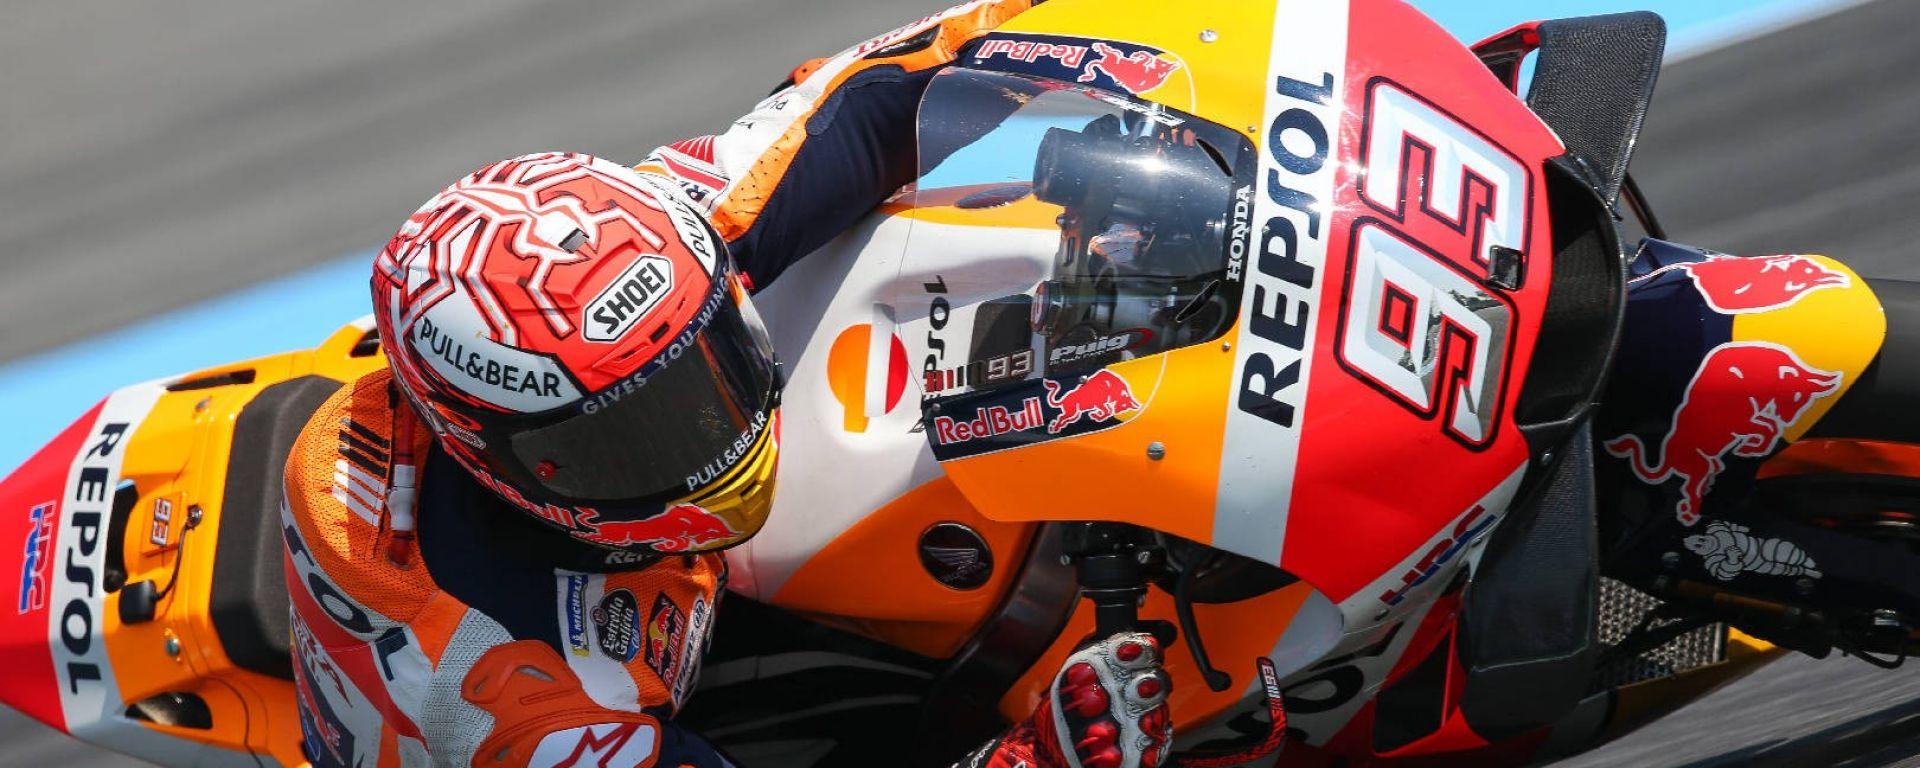 GP Thailandia, Buriram. Marquez vince davanti a Dovizioso